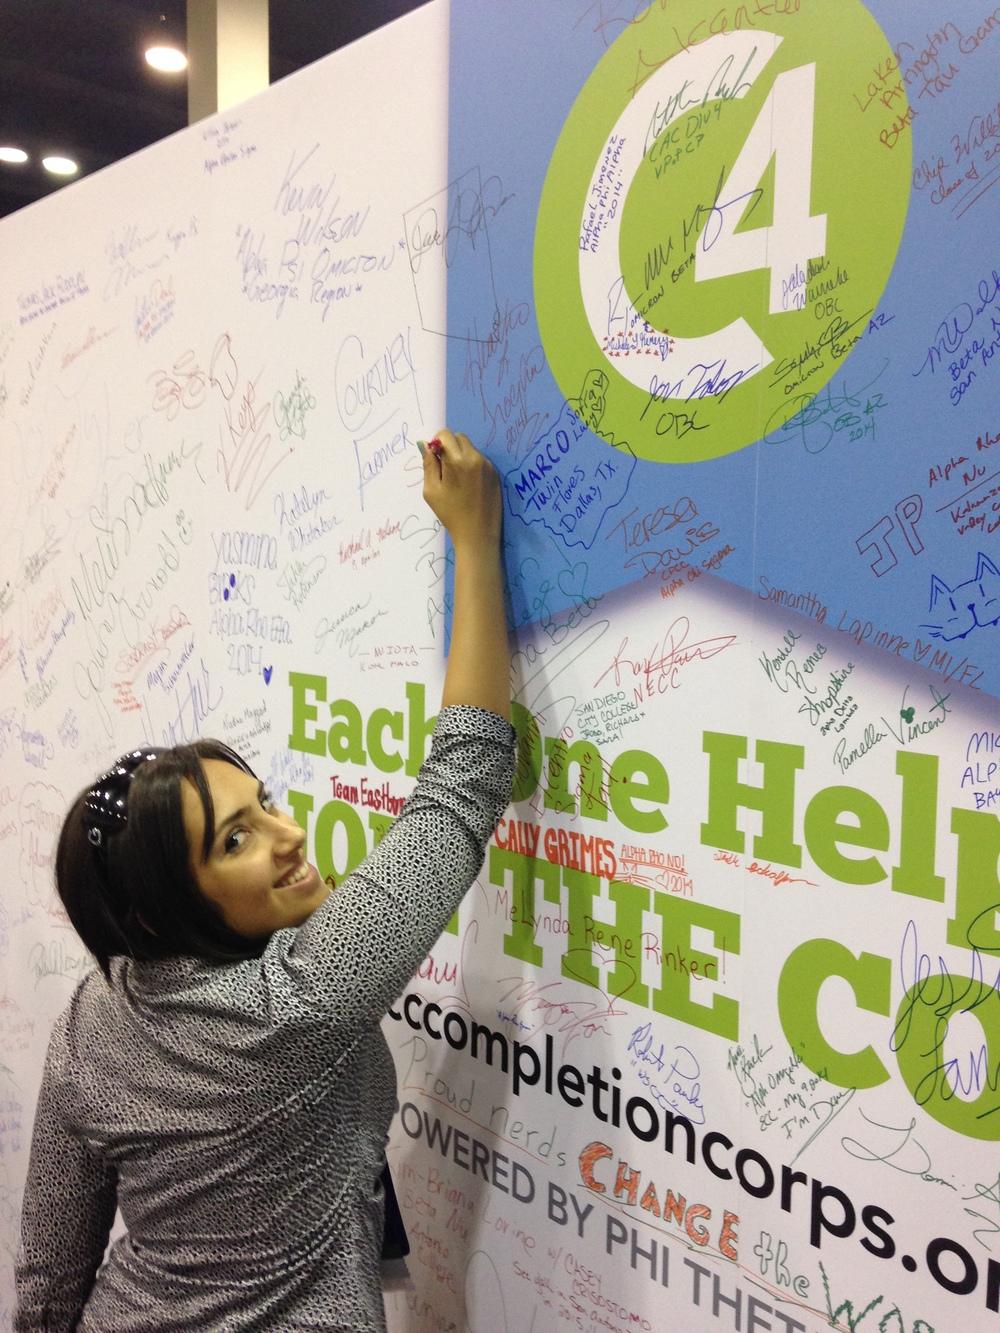 Sara signing the C4 poster